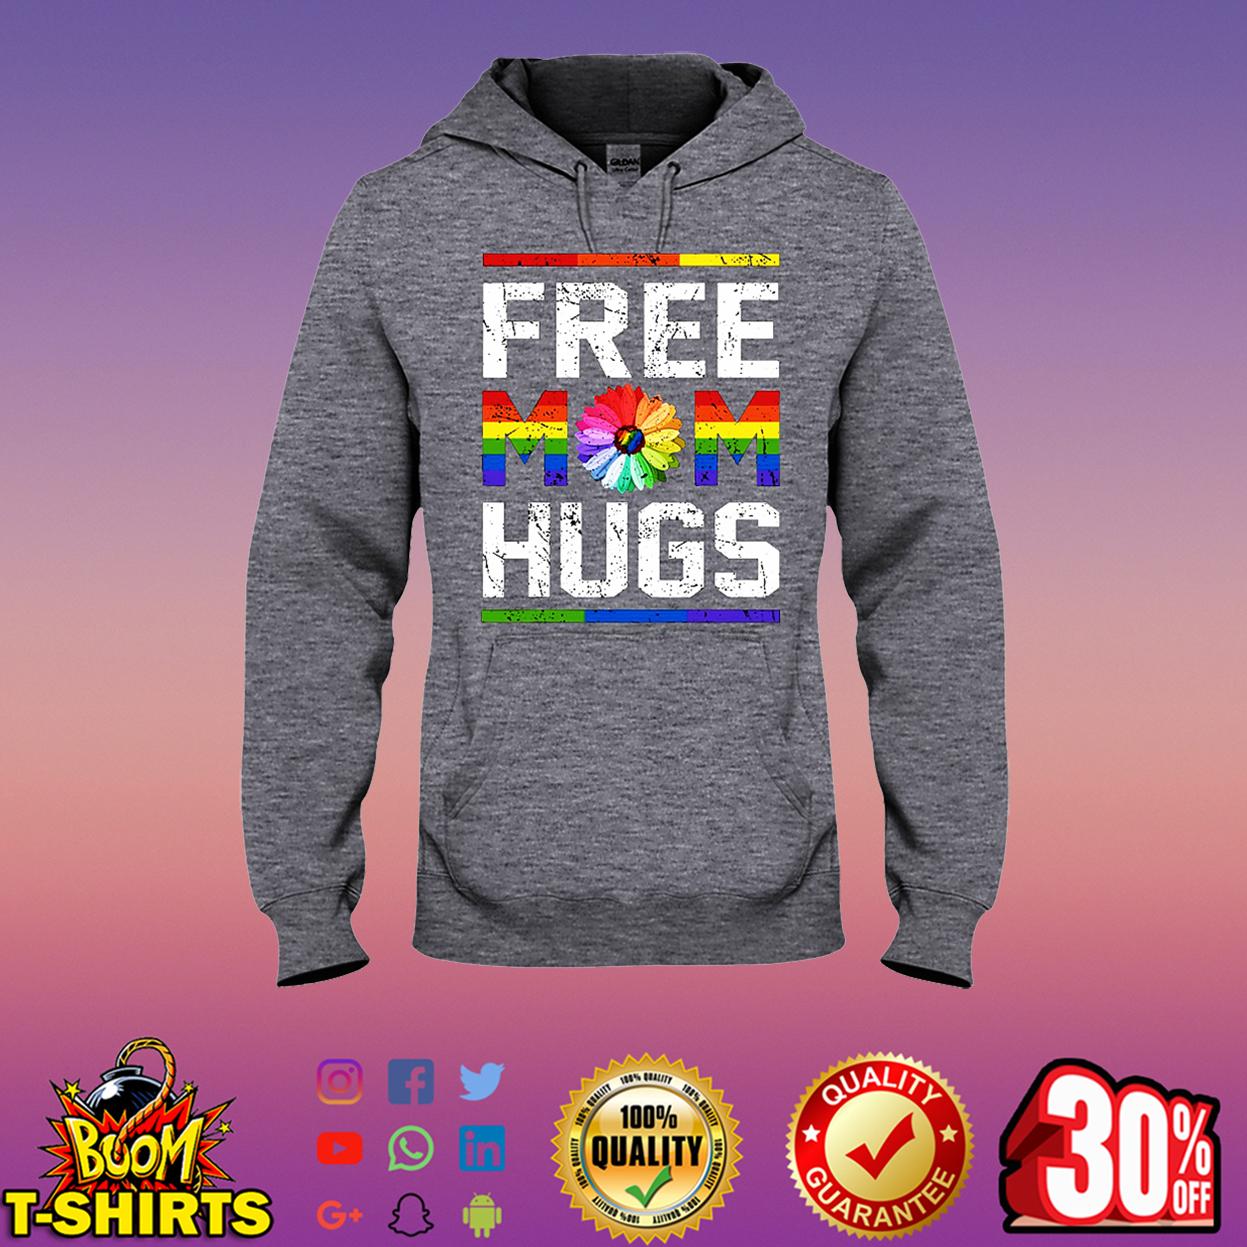 Free Mom Hugs LGBT hooded sweatshirt